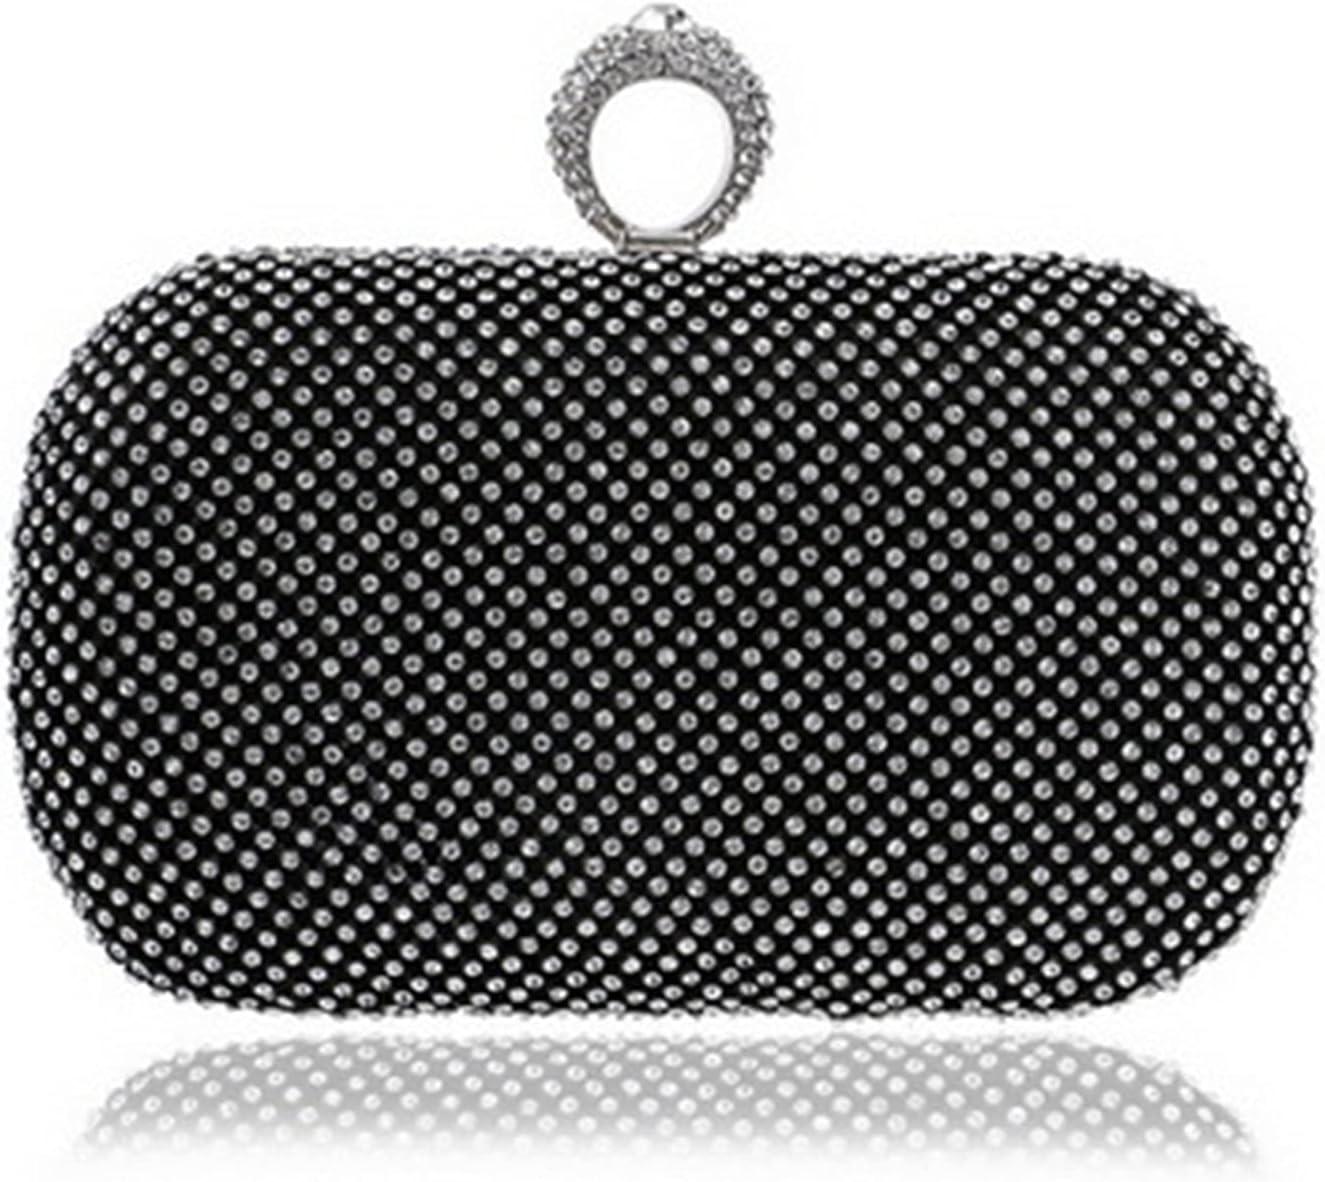 Evening Clutch Bag Luxury Women Clutch Chain Shoulder Party Evening Bags Wedding Handbags (Color : Black, Size : Small)